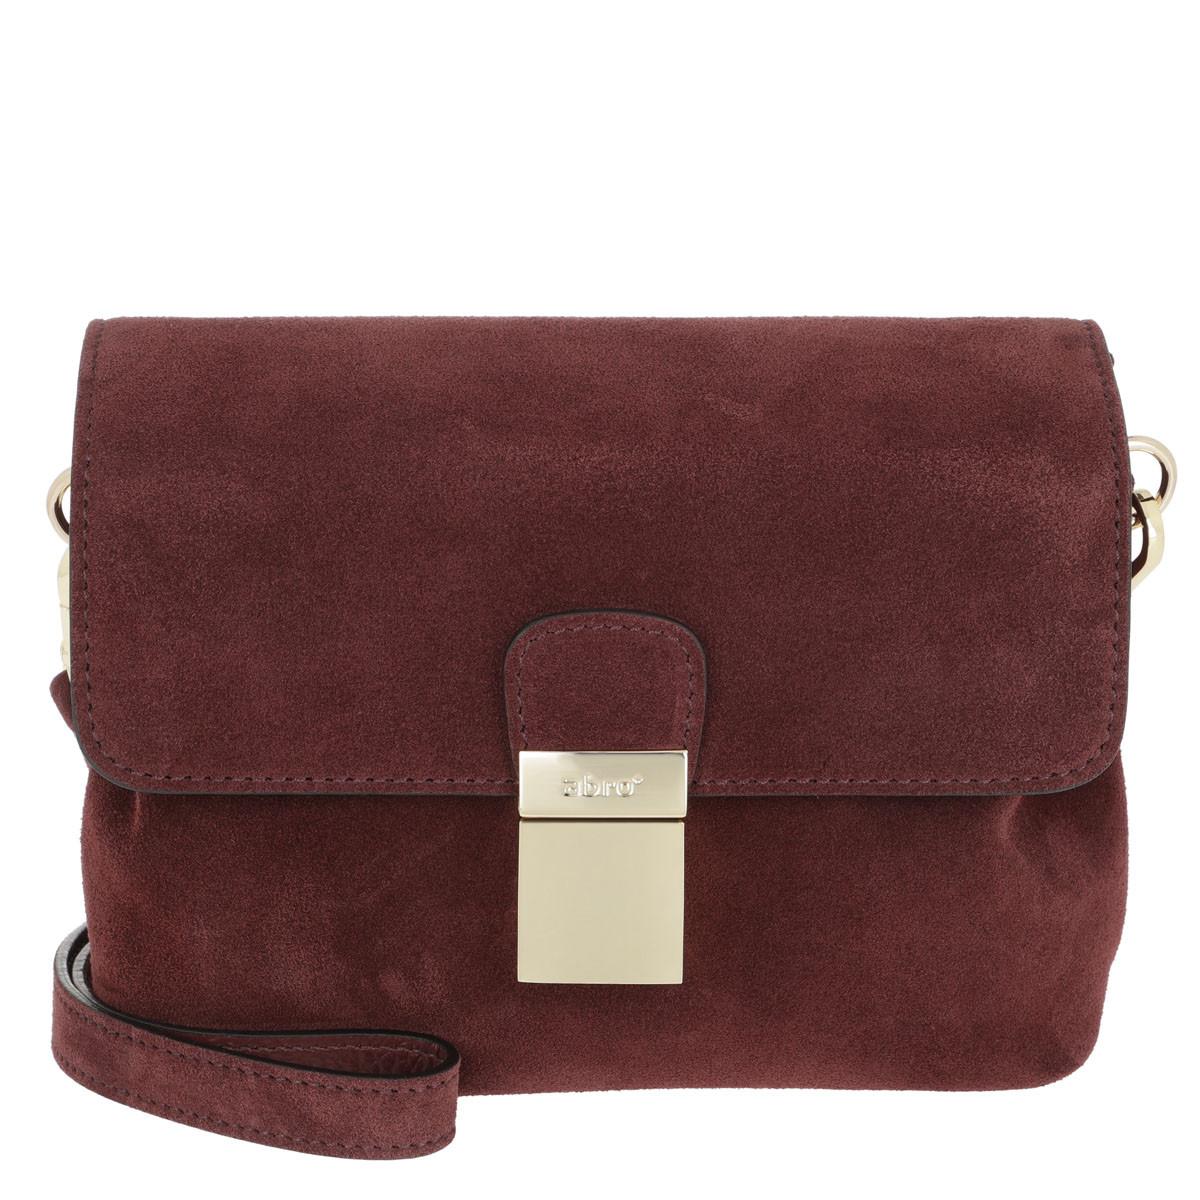 Abro Umhängetasche - Suede Crossbody Bag Small Rust - in rot - für Damen